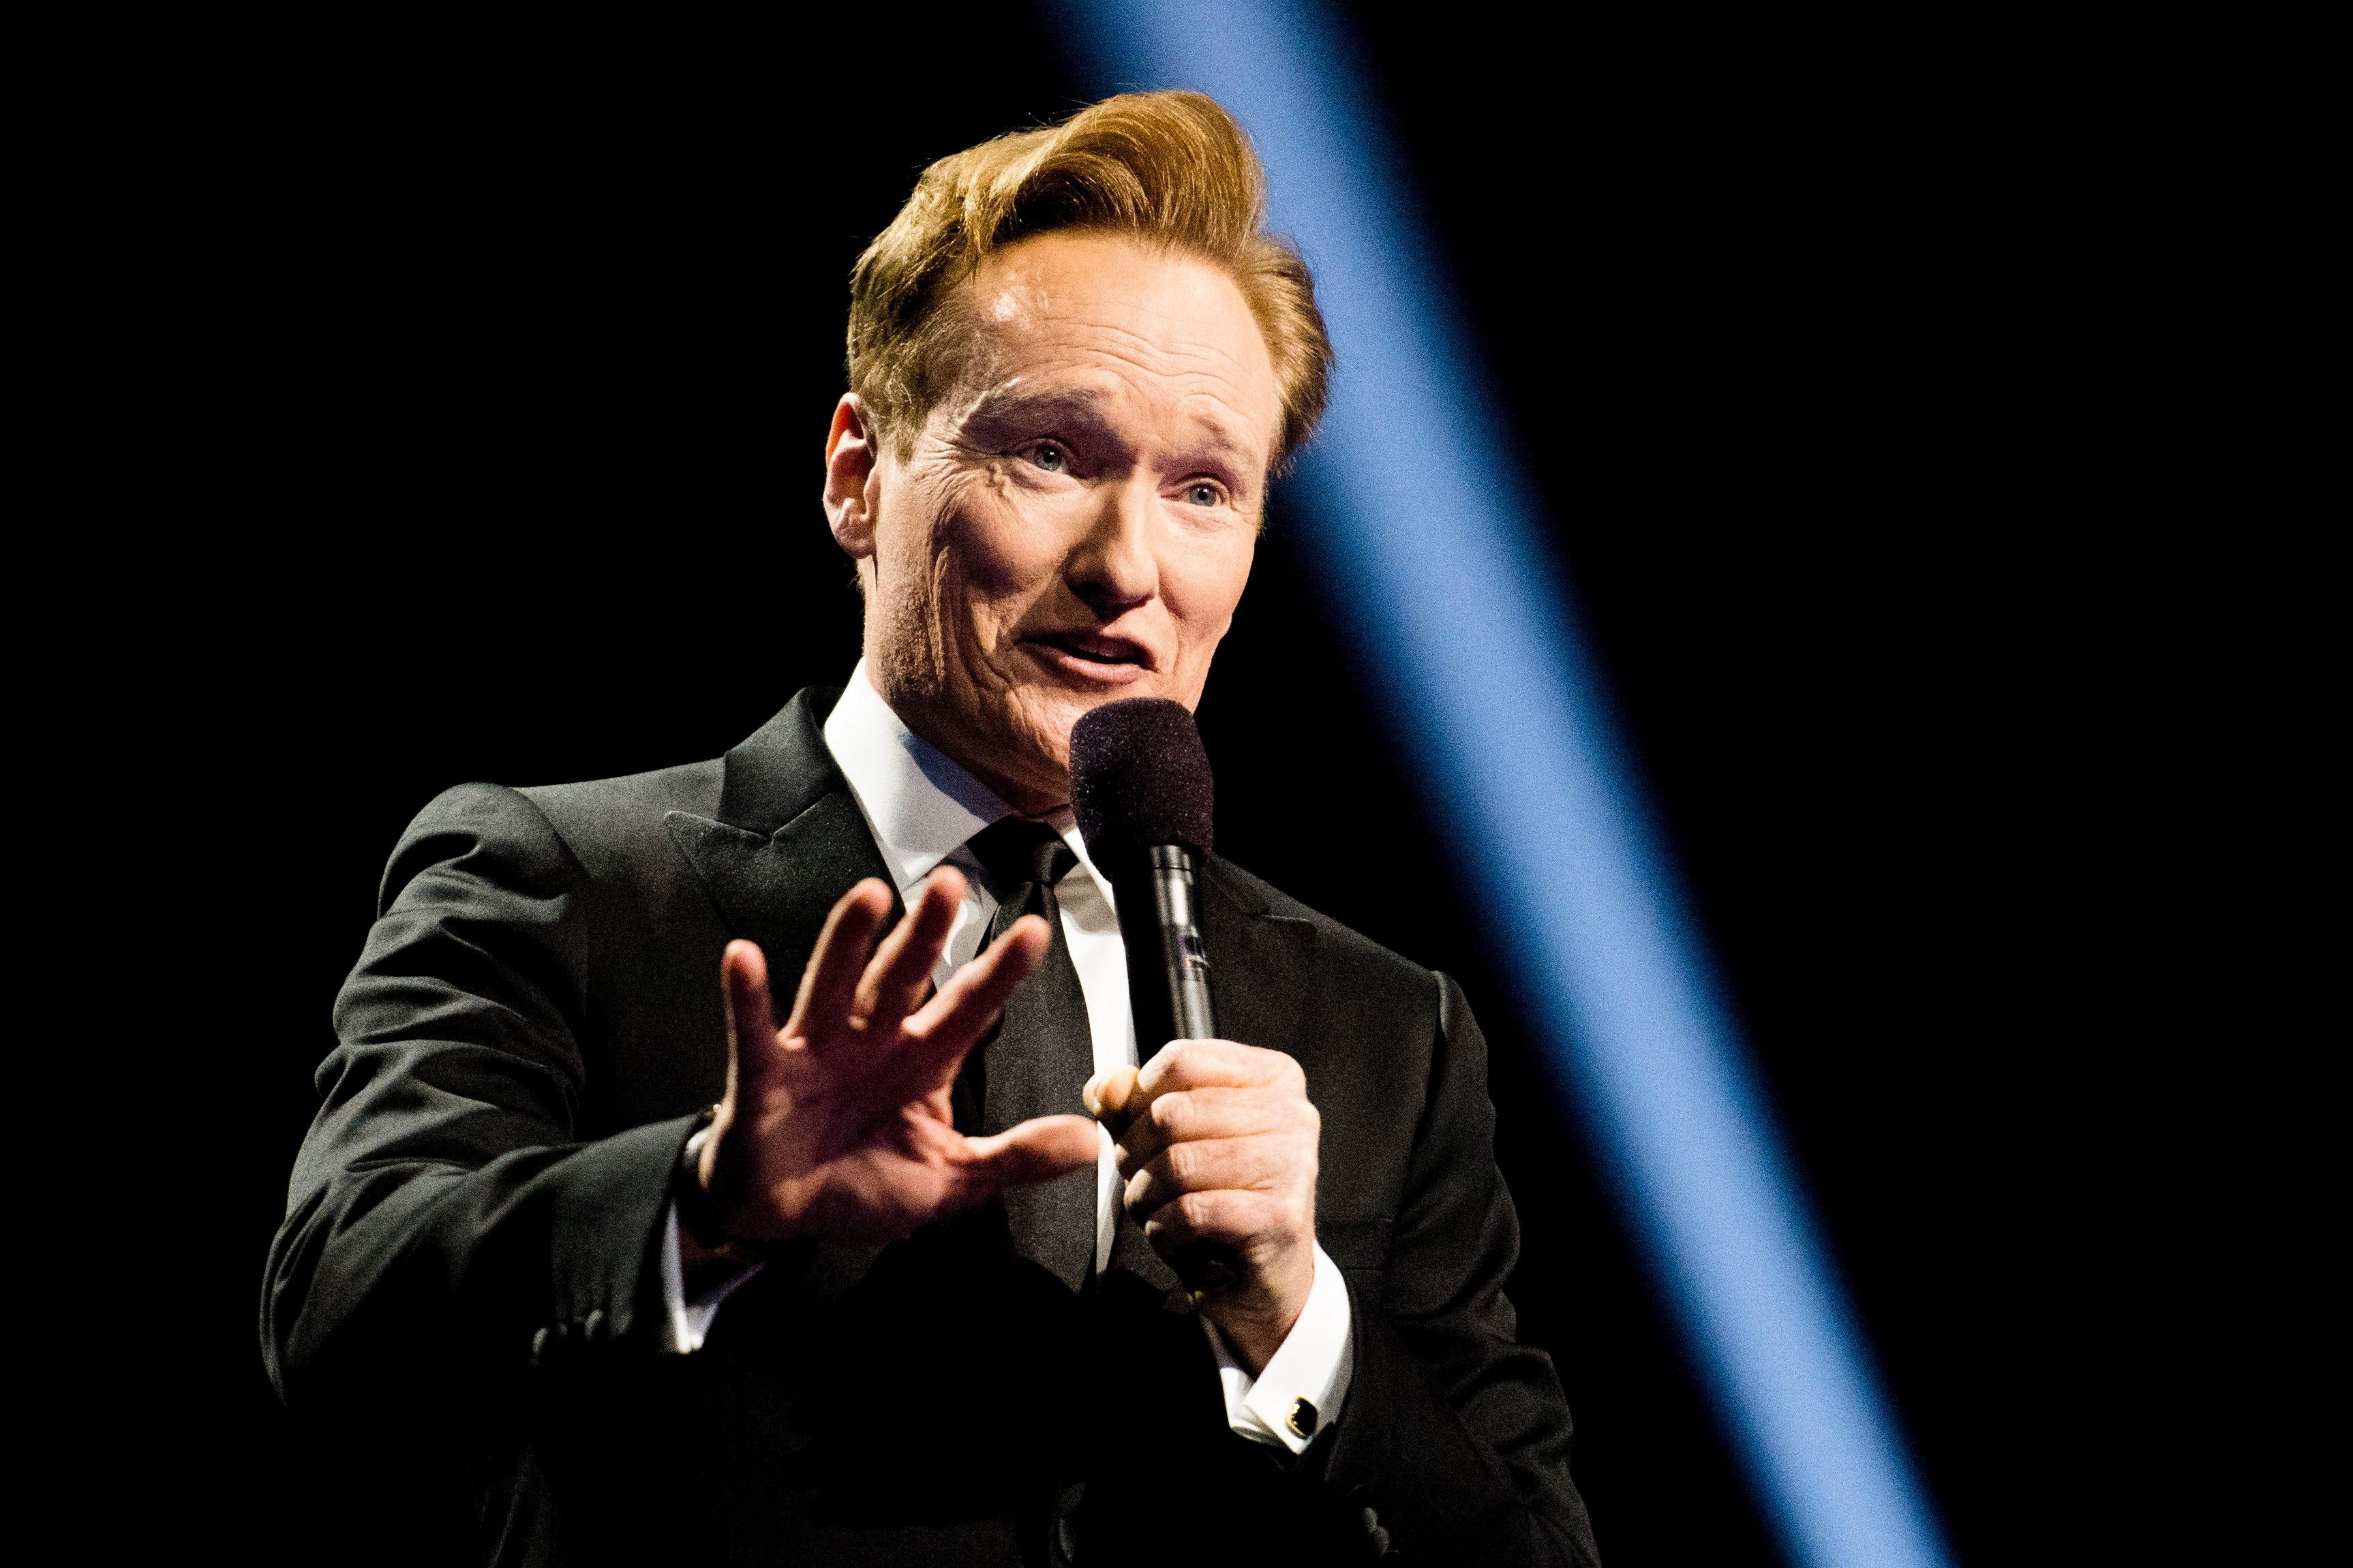 Conan: Michael Cohen inspires Donald Trump to rehire him